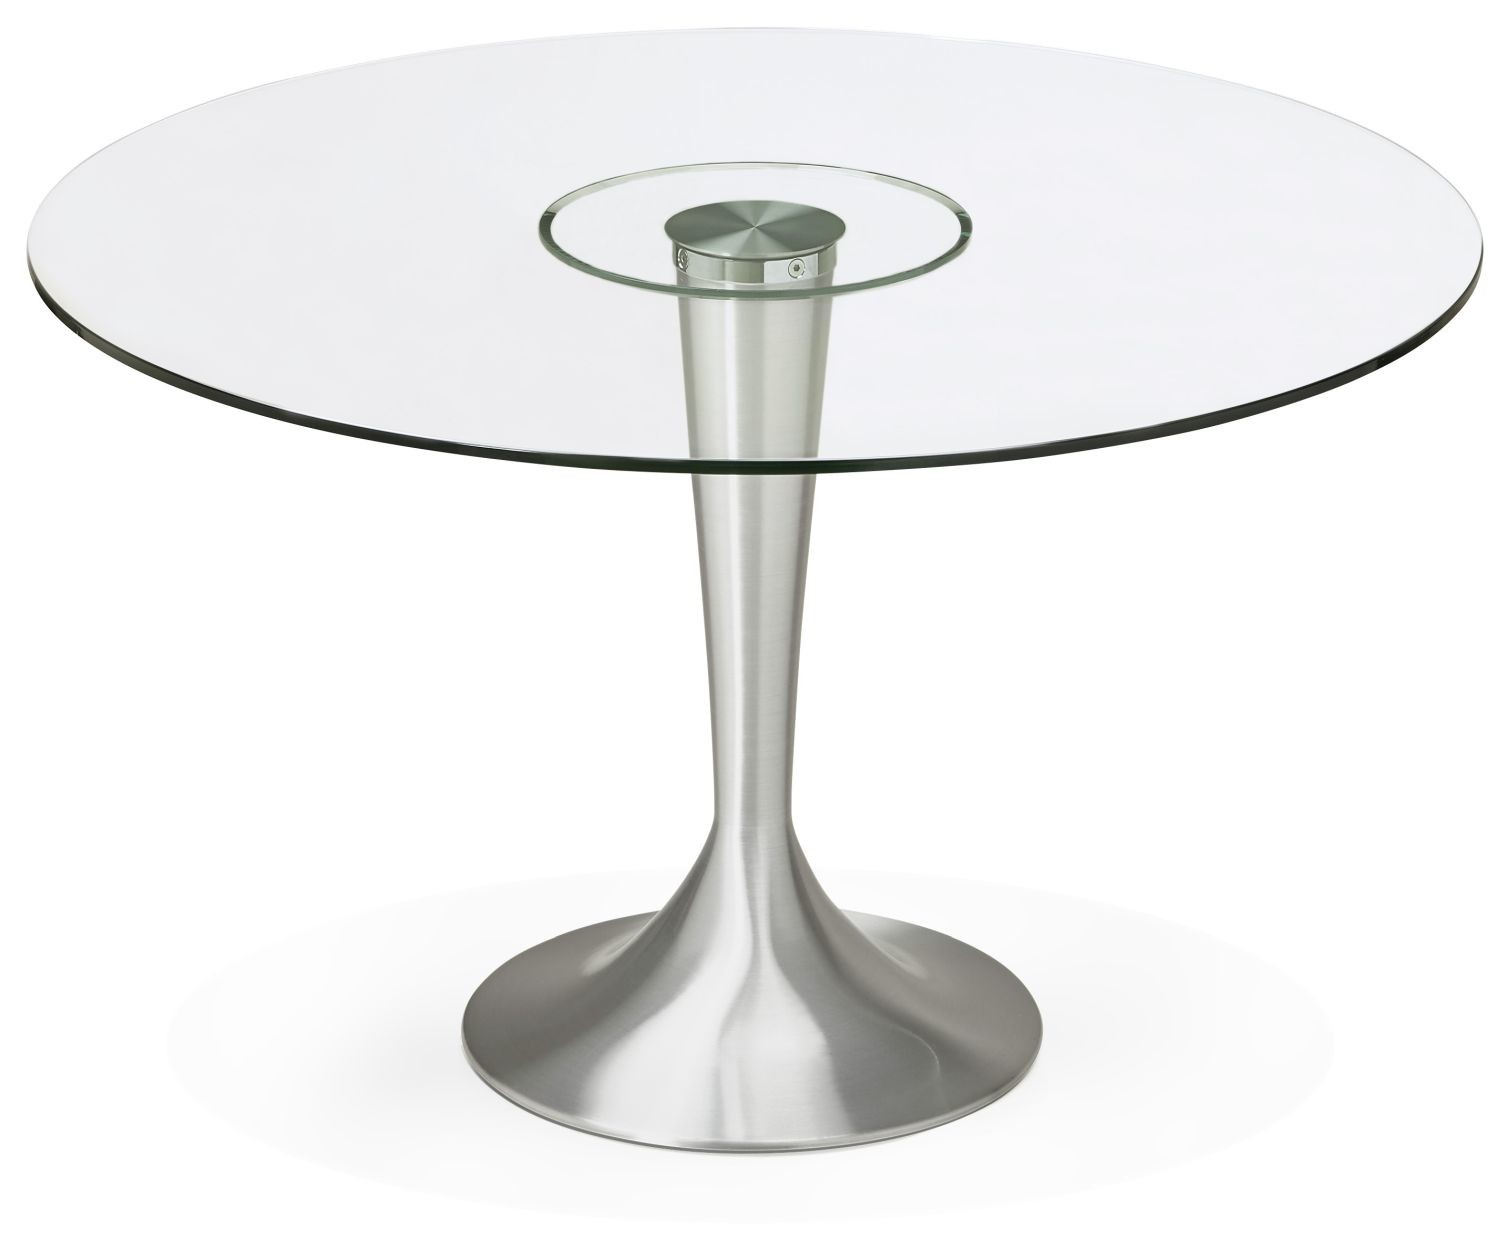 24Designs Ronde Eettafel Ravi -Ø120x76 - Glazen Tafelblad - Aluminium Onderstel